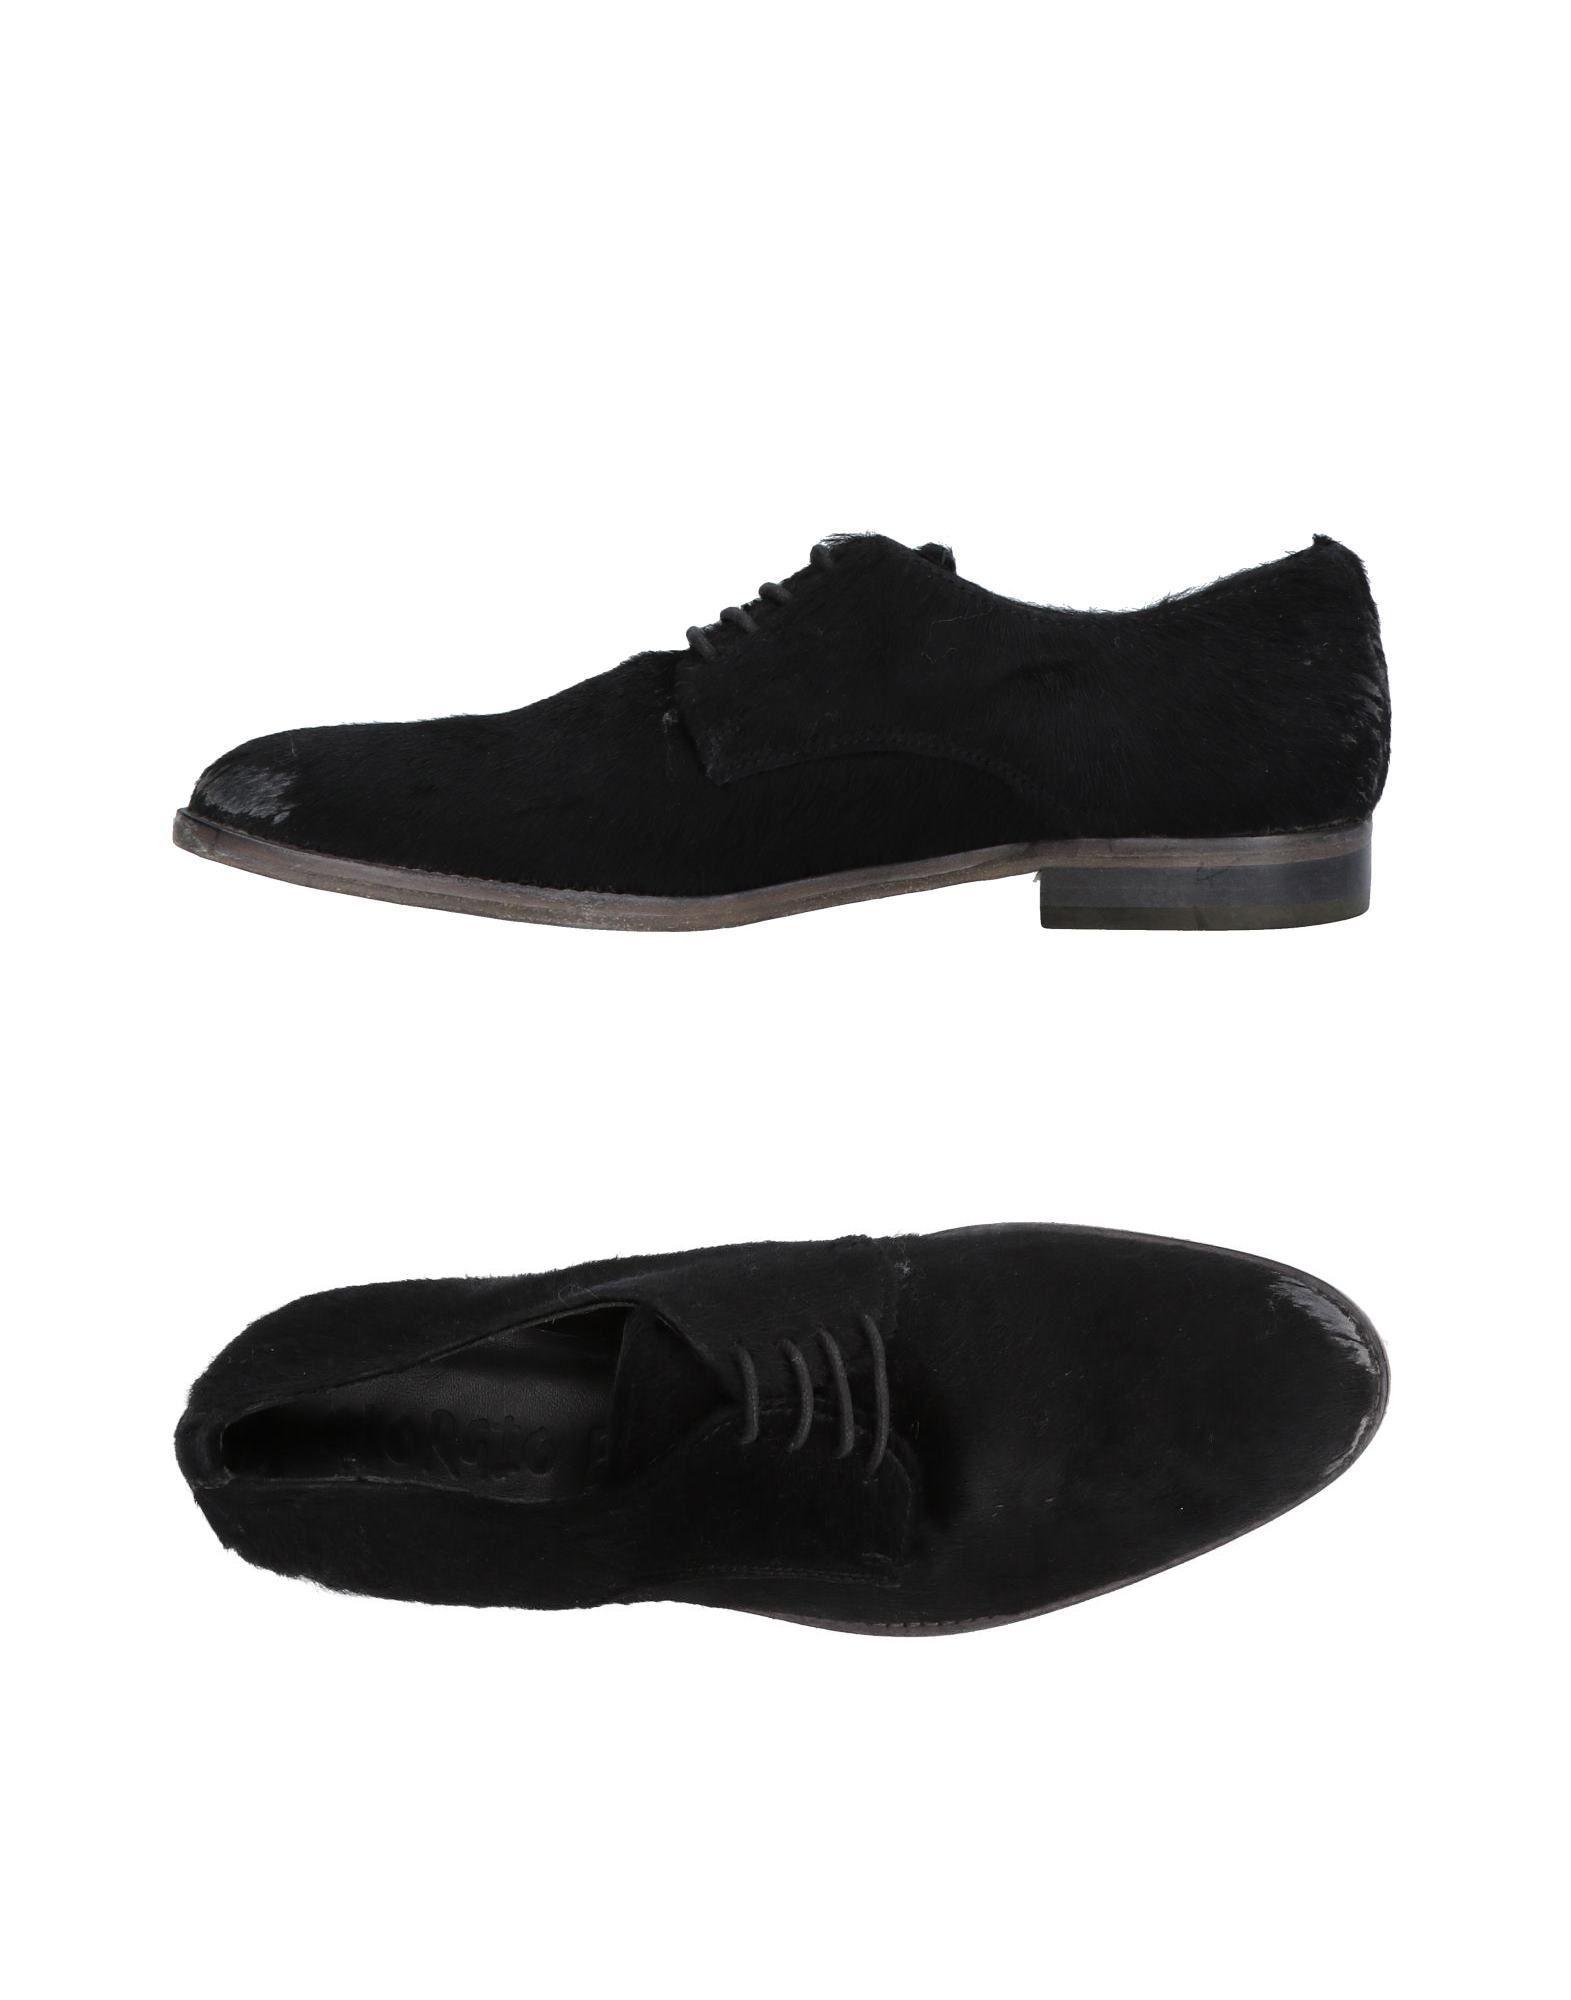 Stilvolle billige Schnürschuhe Schuhe Giorgio Brato Schnürschuhe billige Damen  11458449VA 8c3ac3